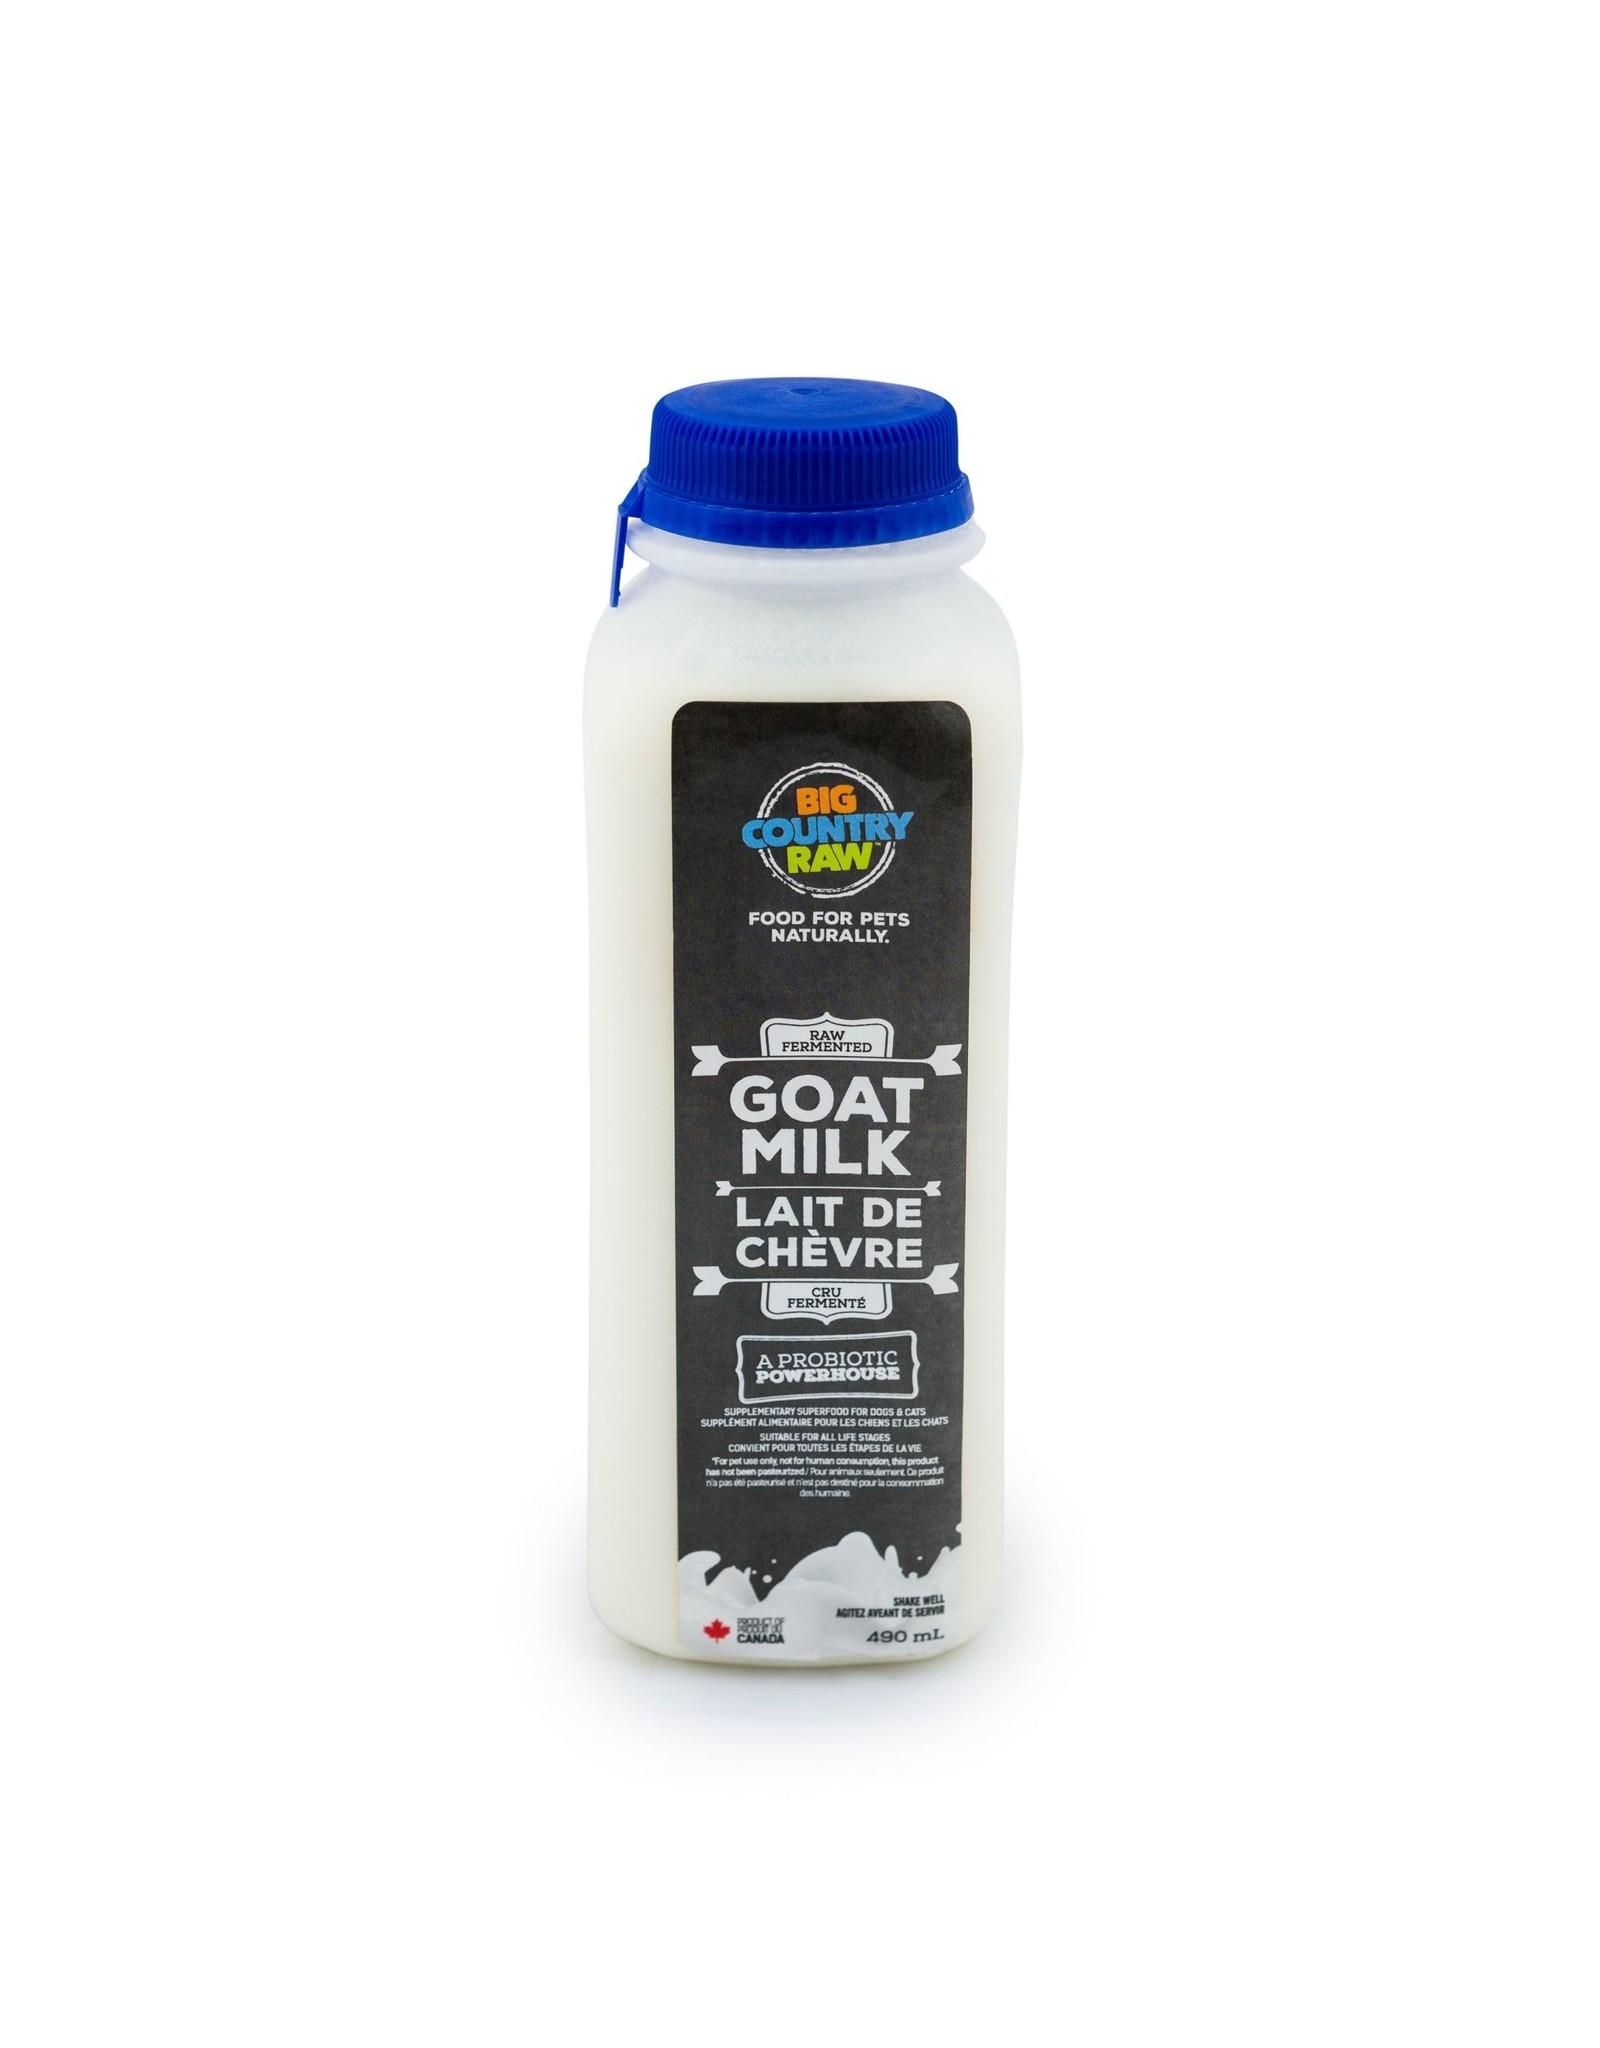 Big Country Raw BCR Raw Goat Milk 490ml